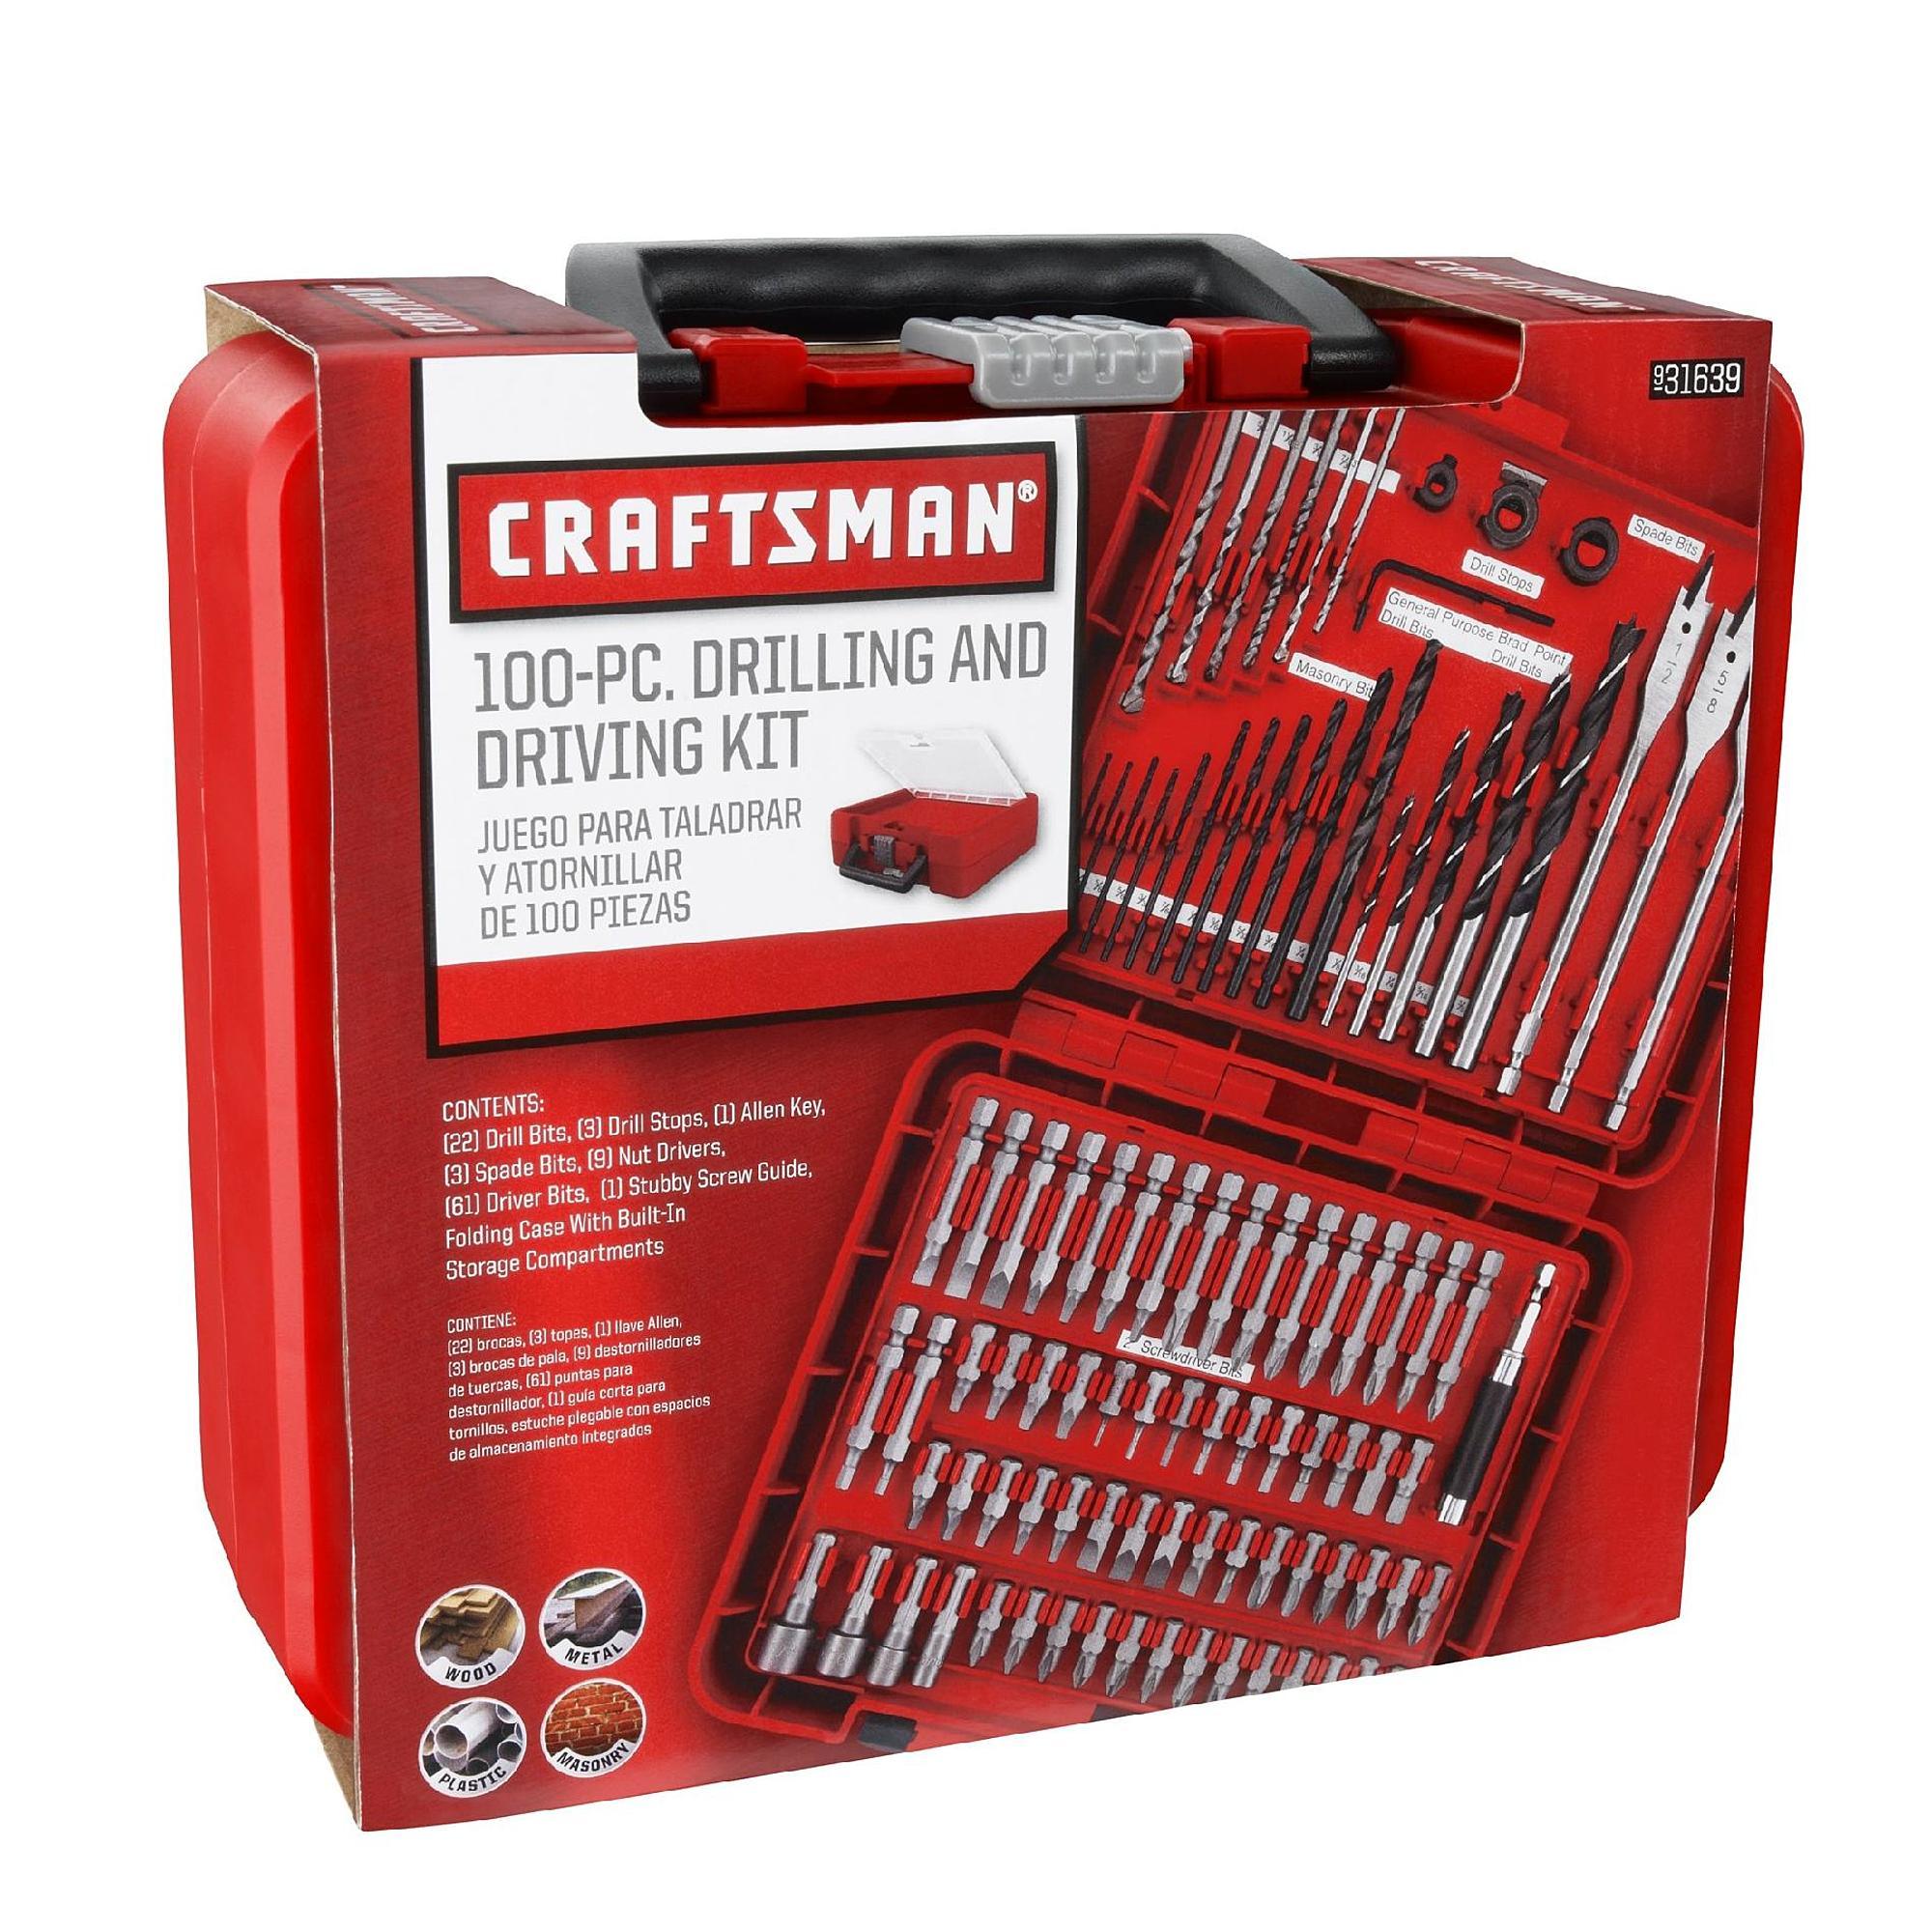 100-Piece Craftsman Drill Bit Accessory Kit $13 + Free Store Pickup at Sears $12.99